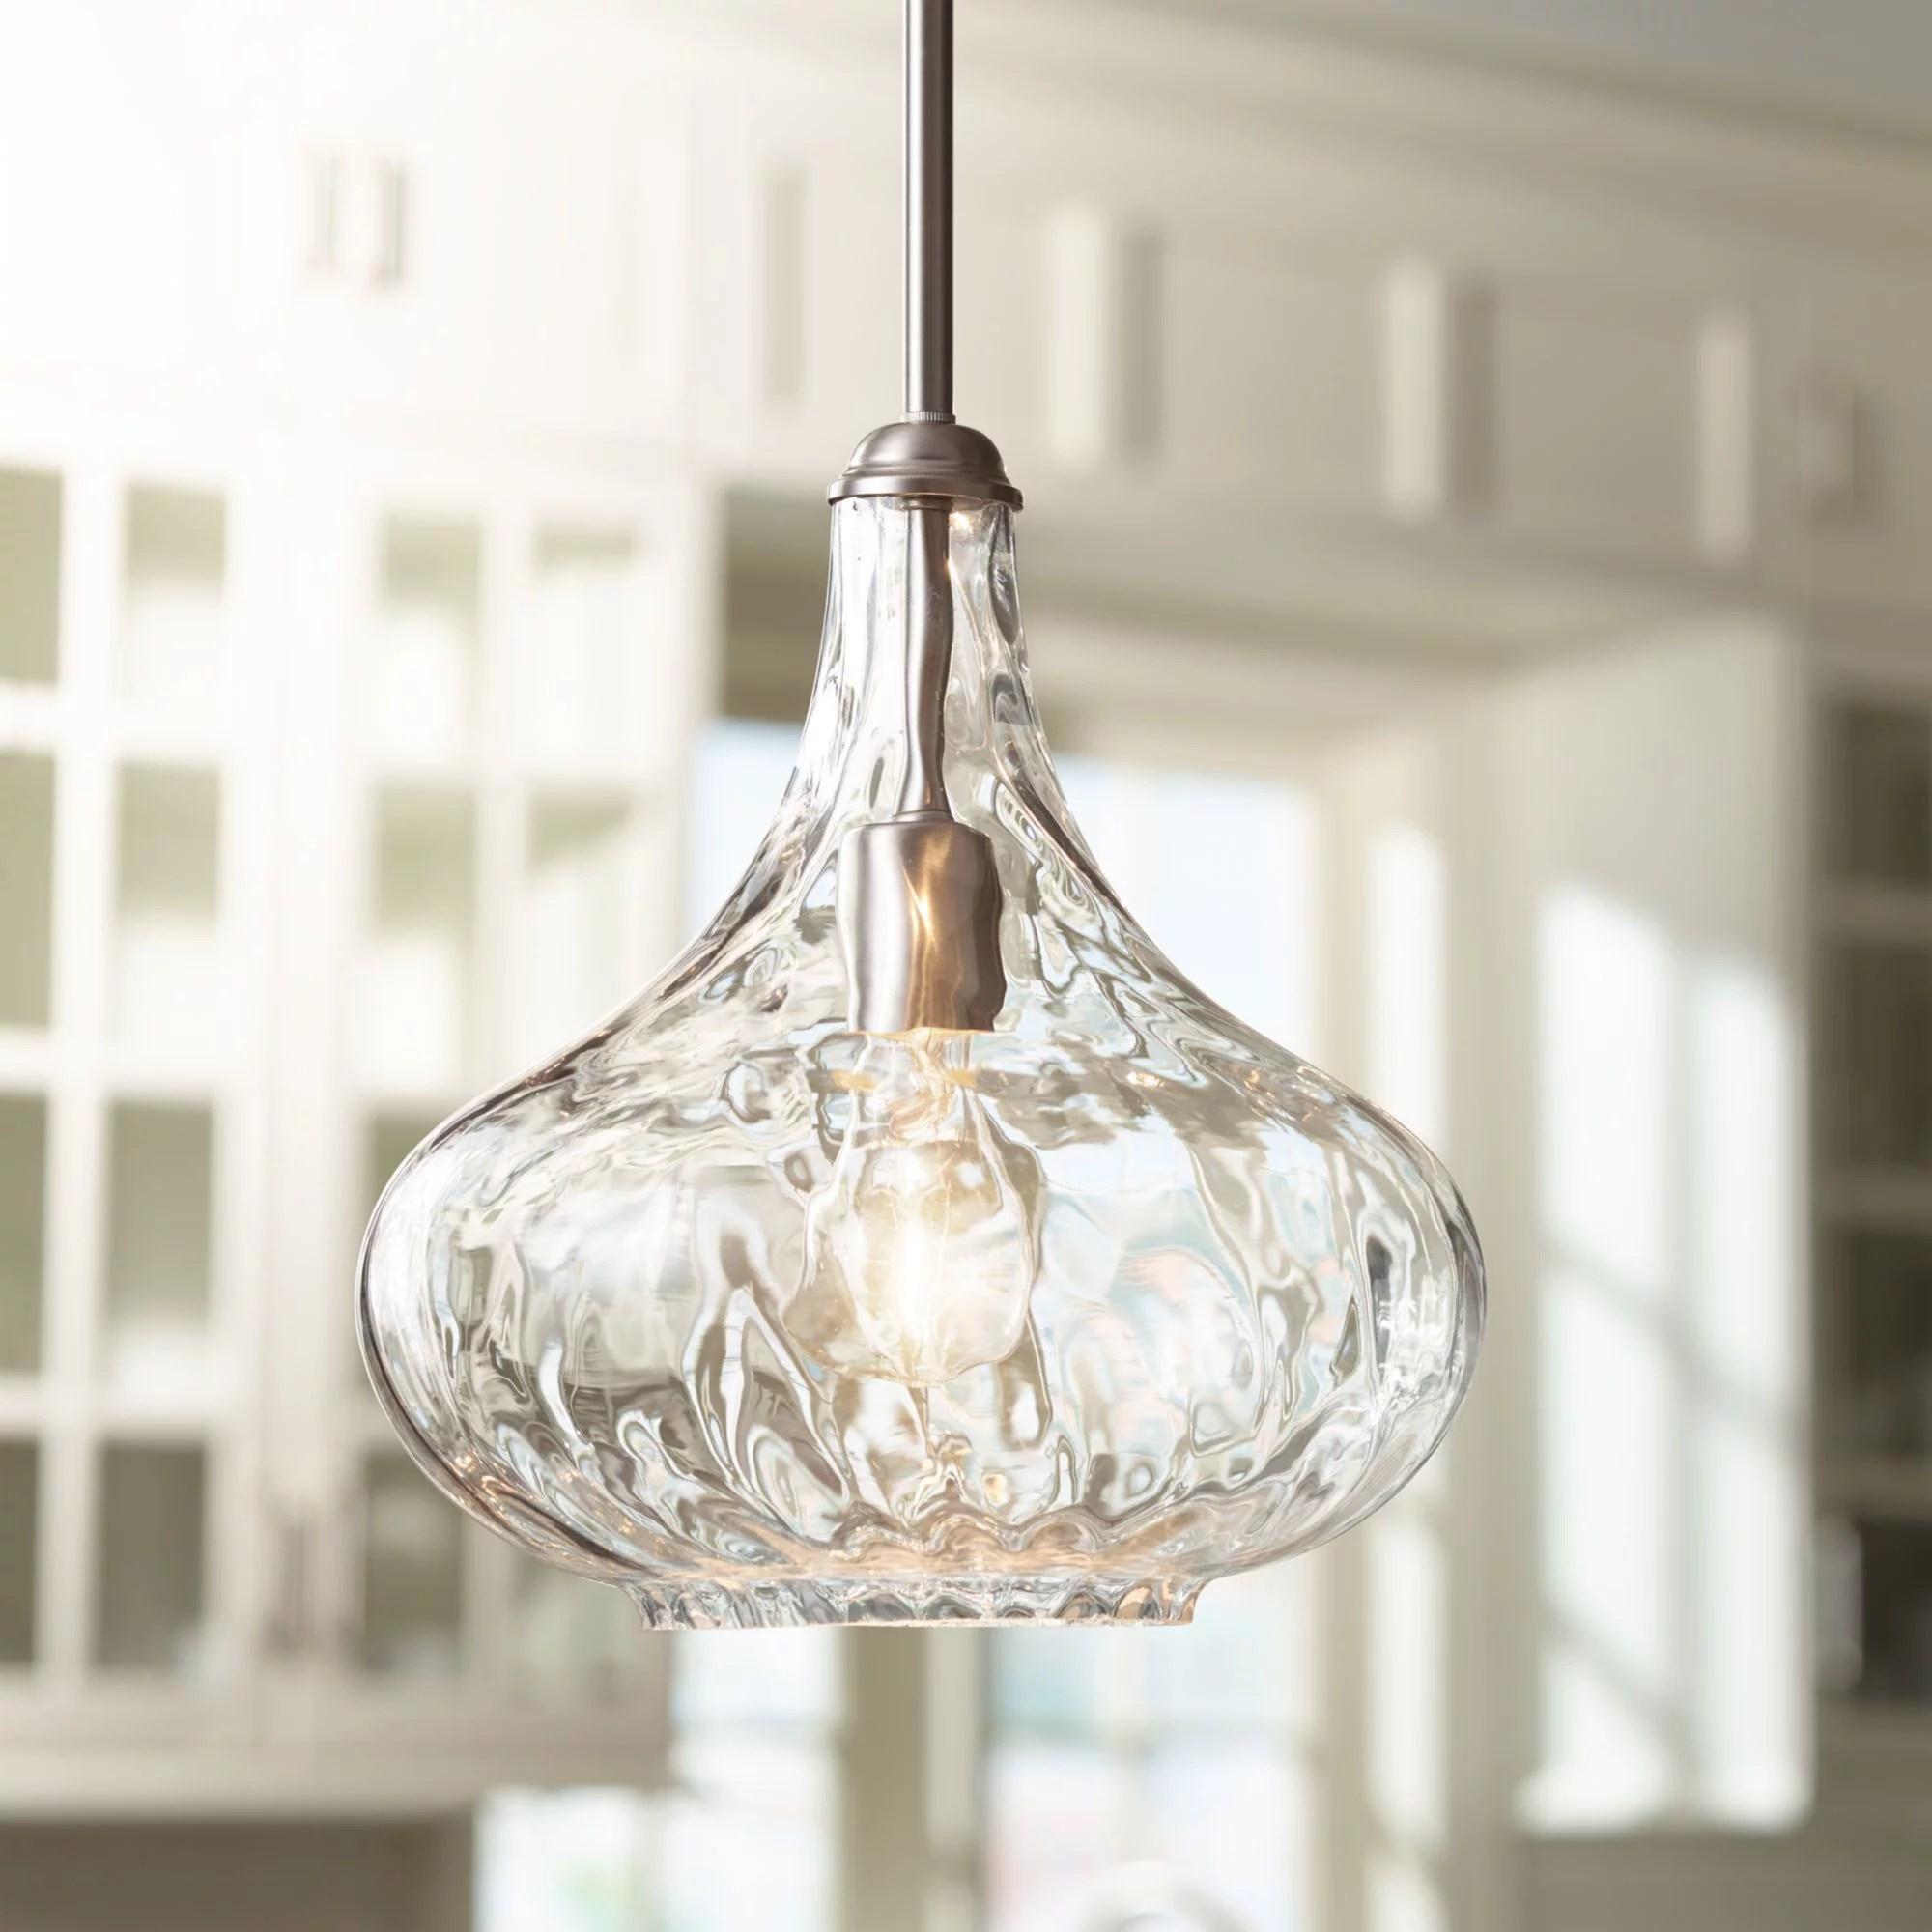 360 lighting brushed nickel mini pendant light 11 wide modern handmade textured glass fixture for kitchen island dining room walmart com